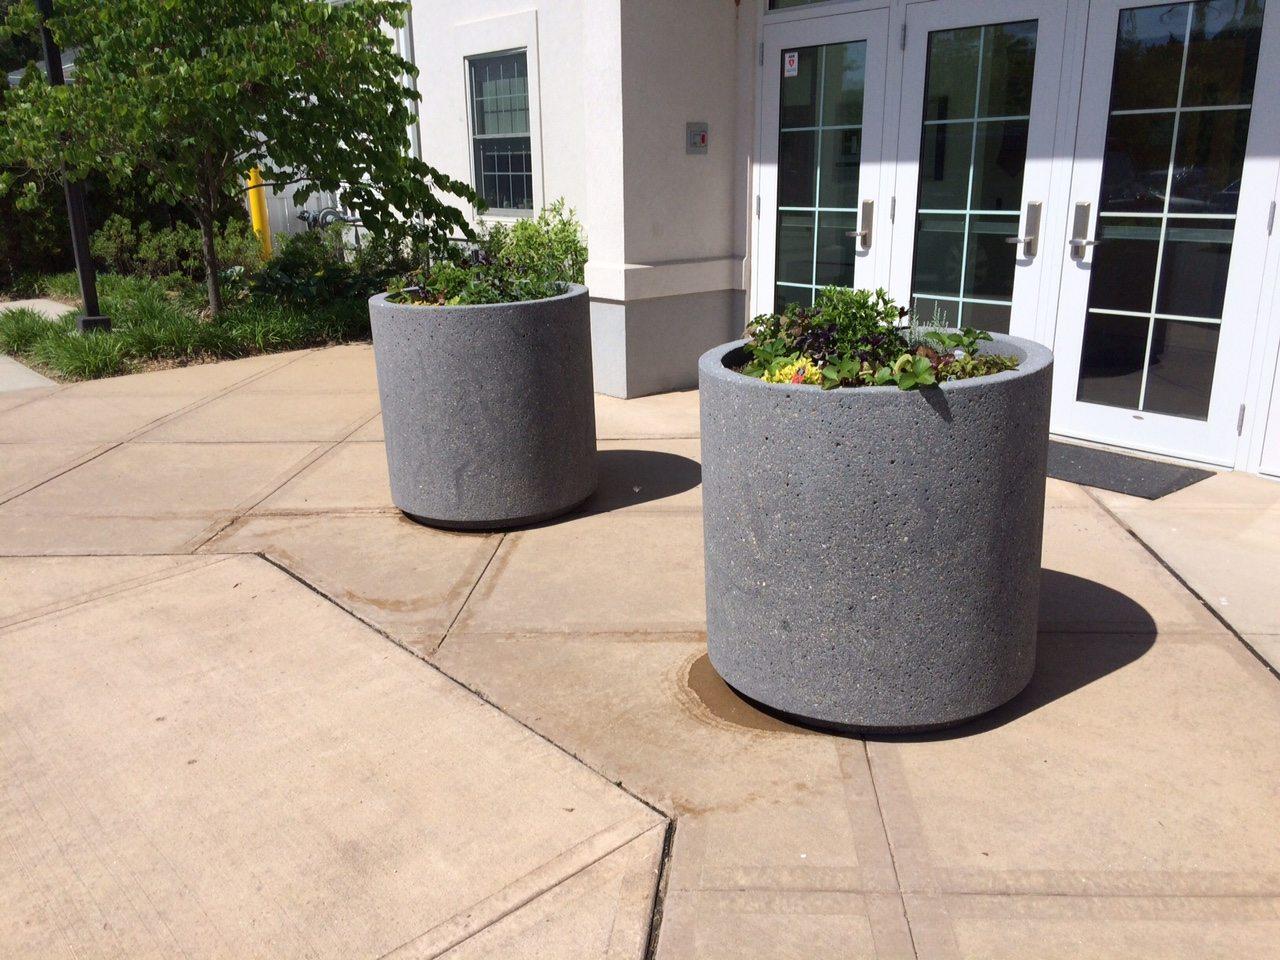 Round Concrete Planter W/ Toe Kick